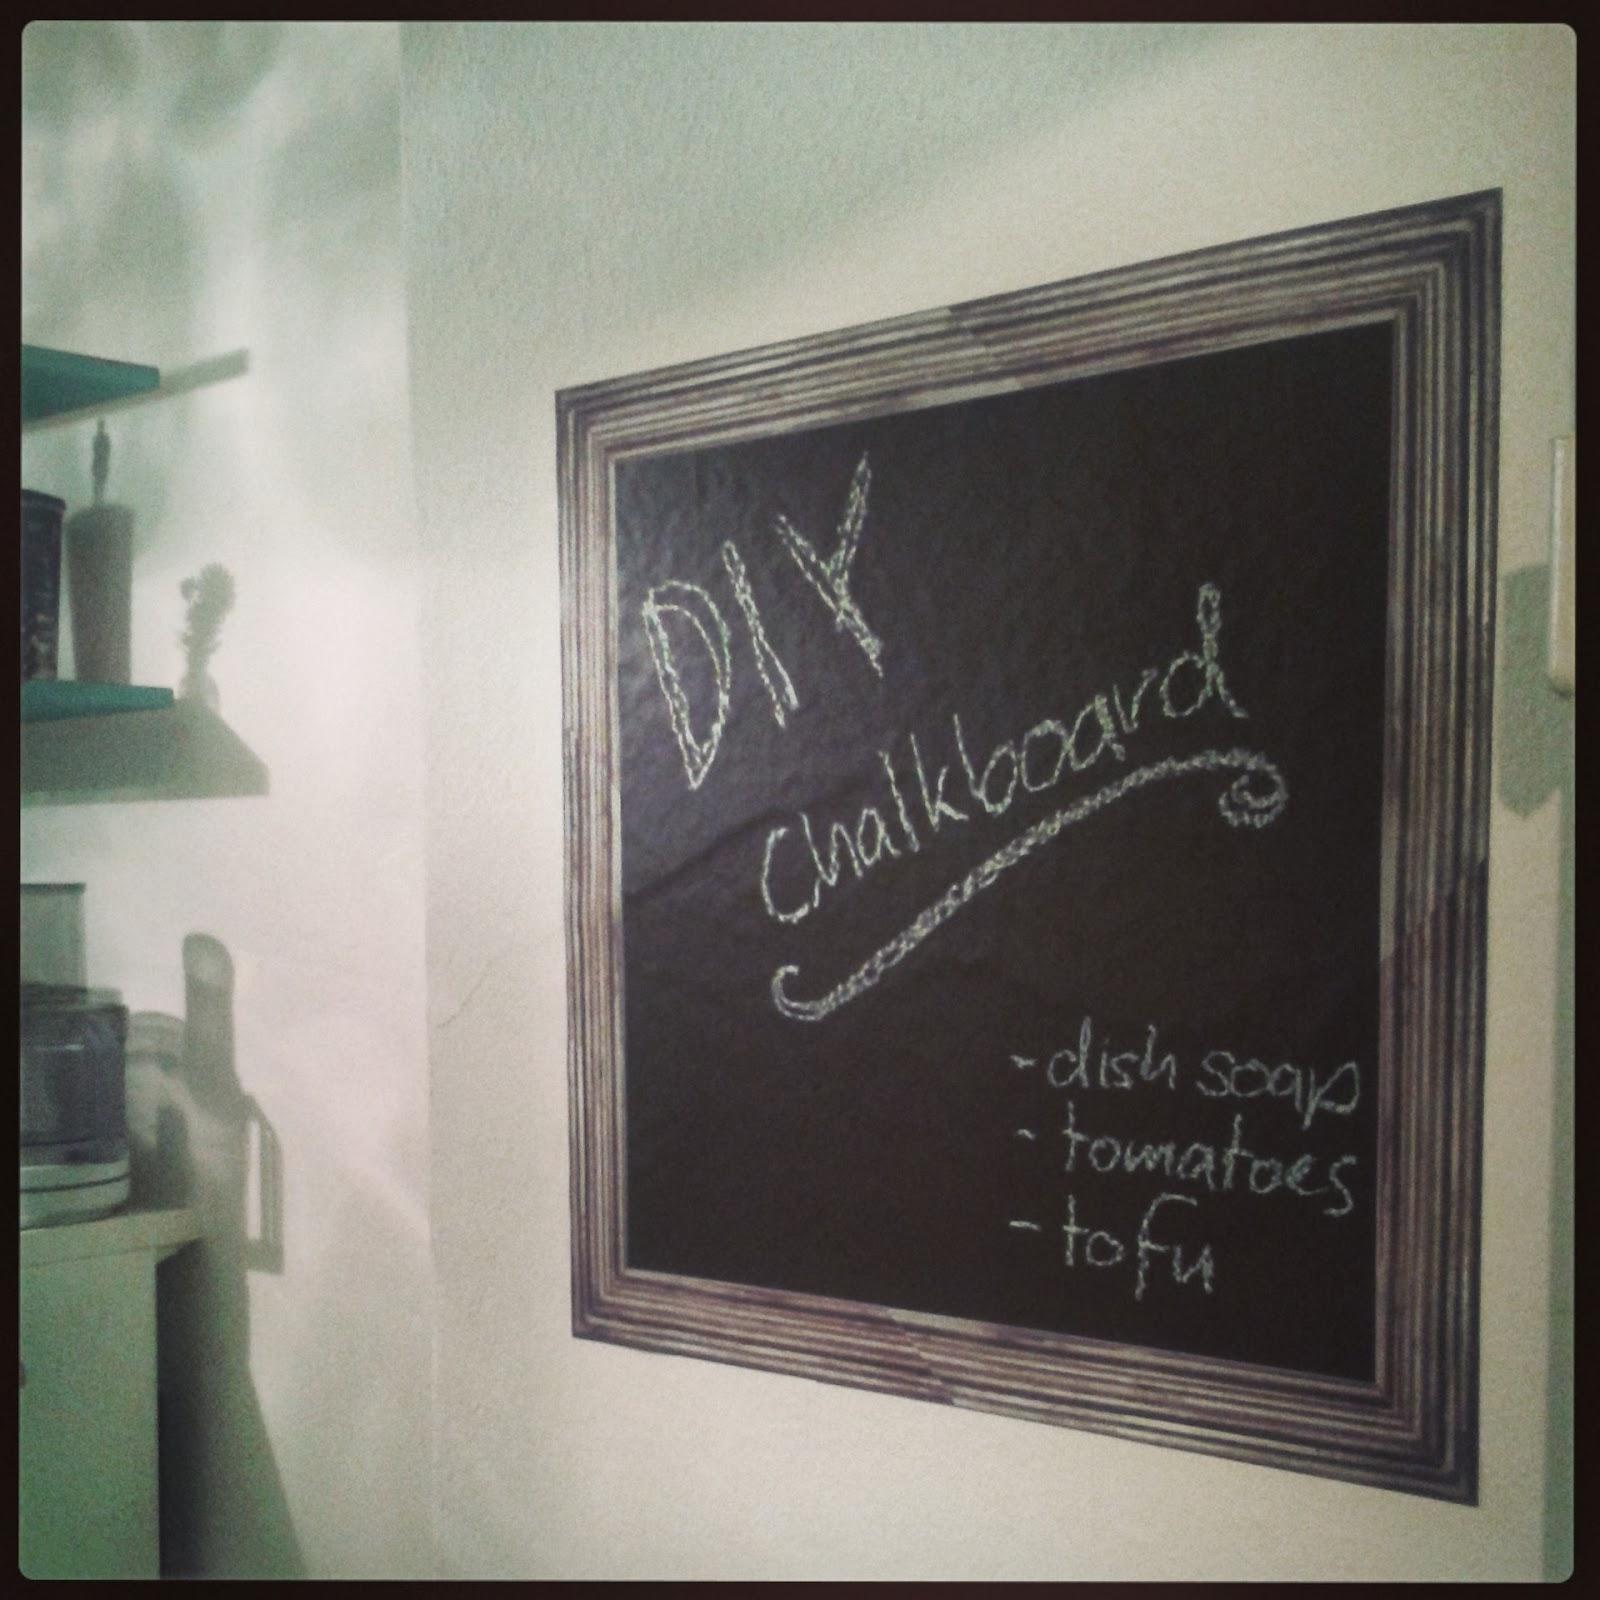 framed chalkboard diy - Diy Framed Chalkboard